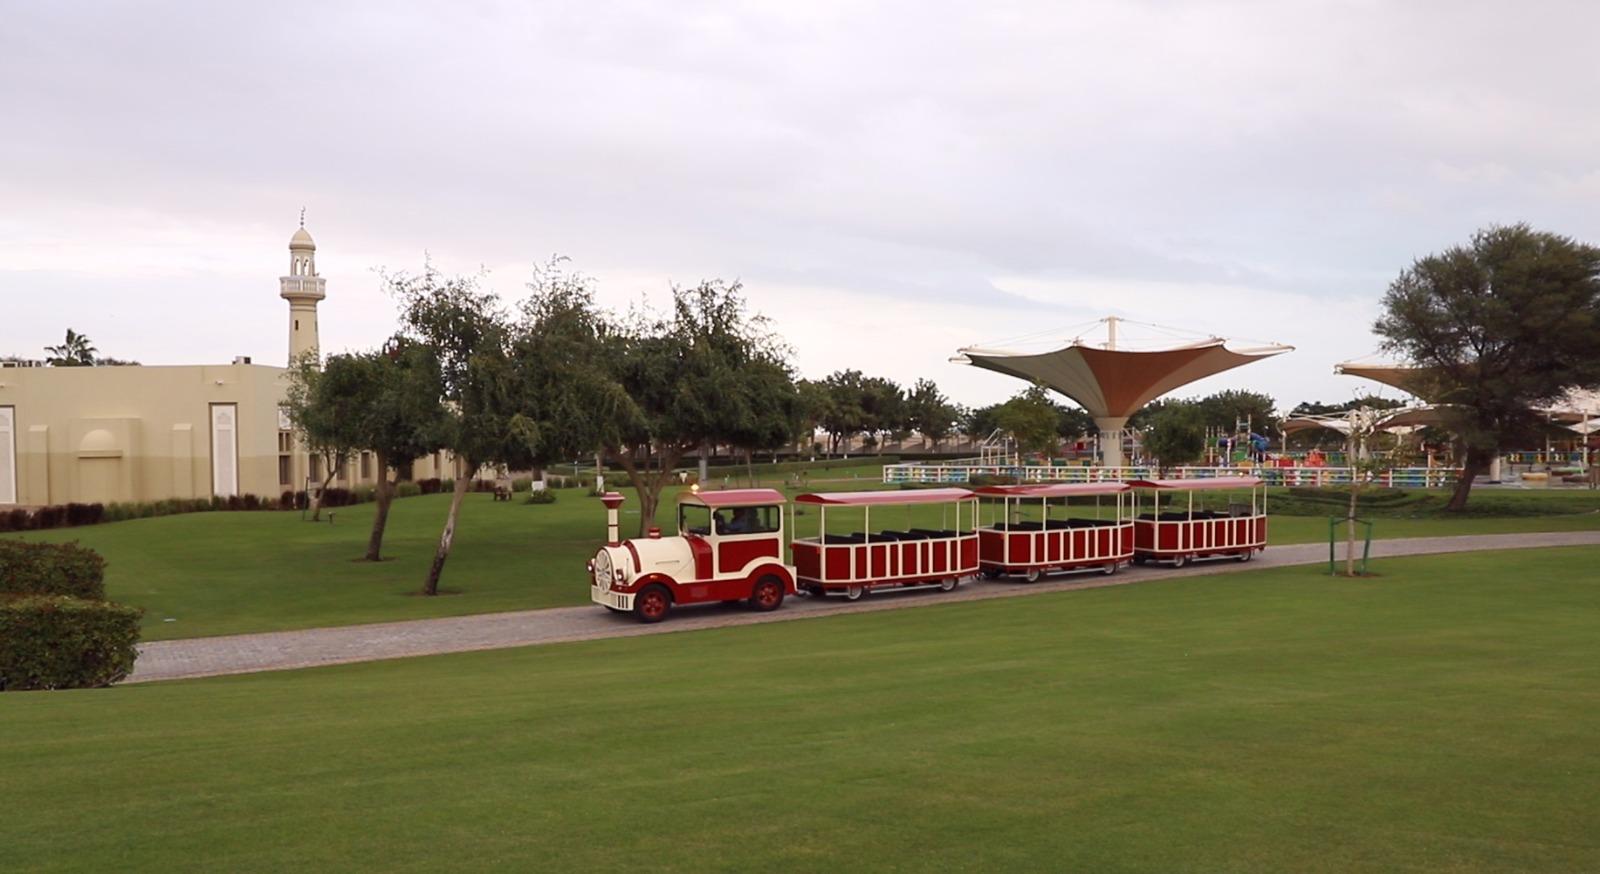 Al Khor Family Park set to reopen for the public on Sunday, 16 Feb 2020